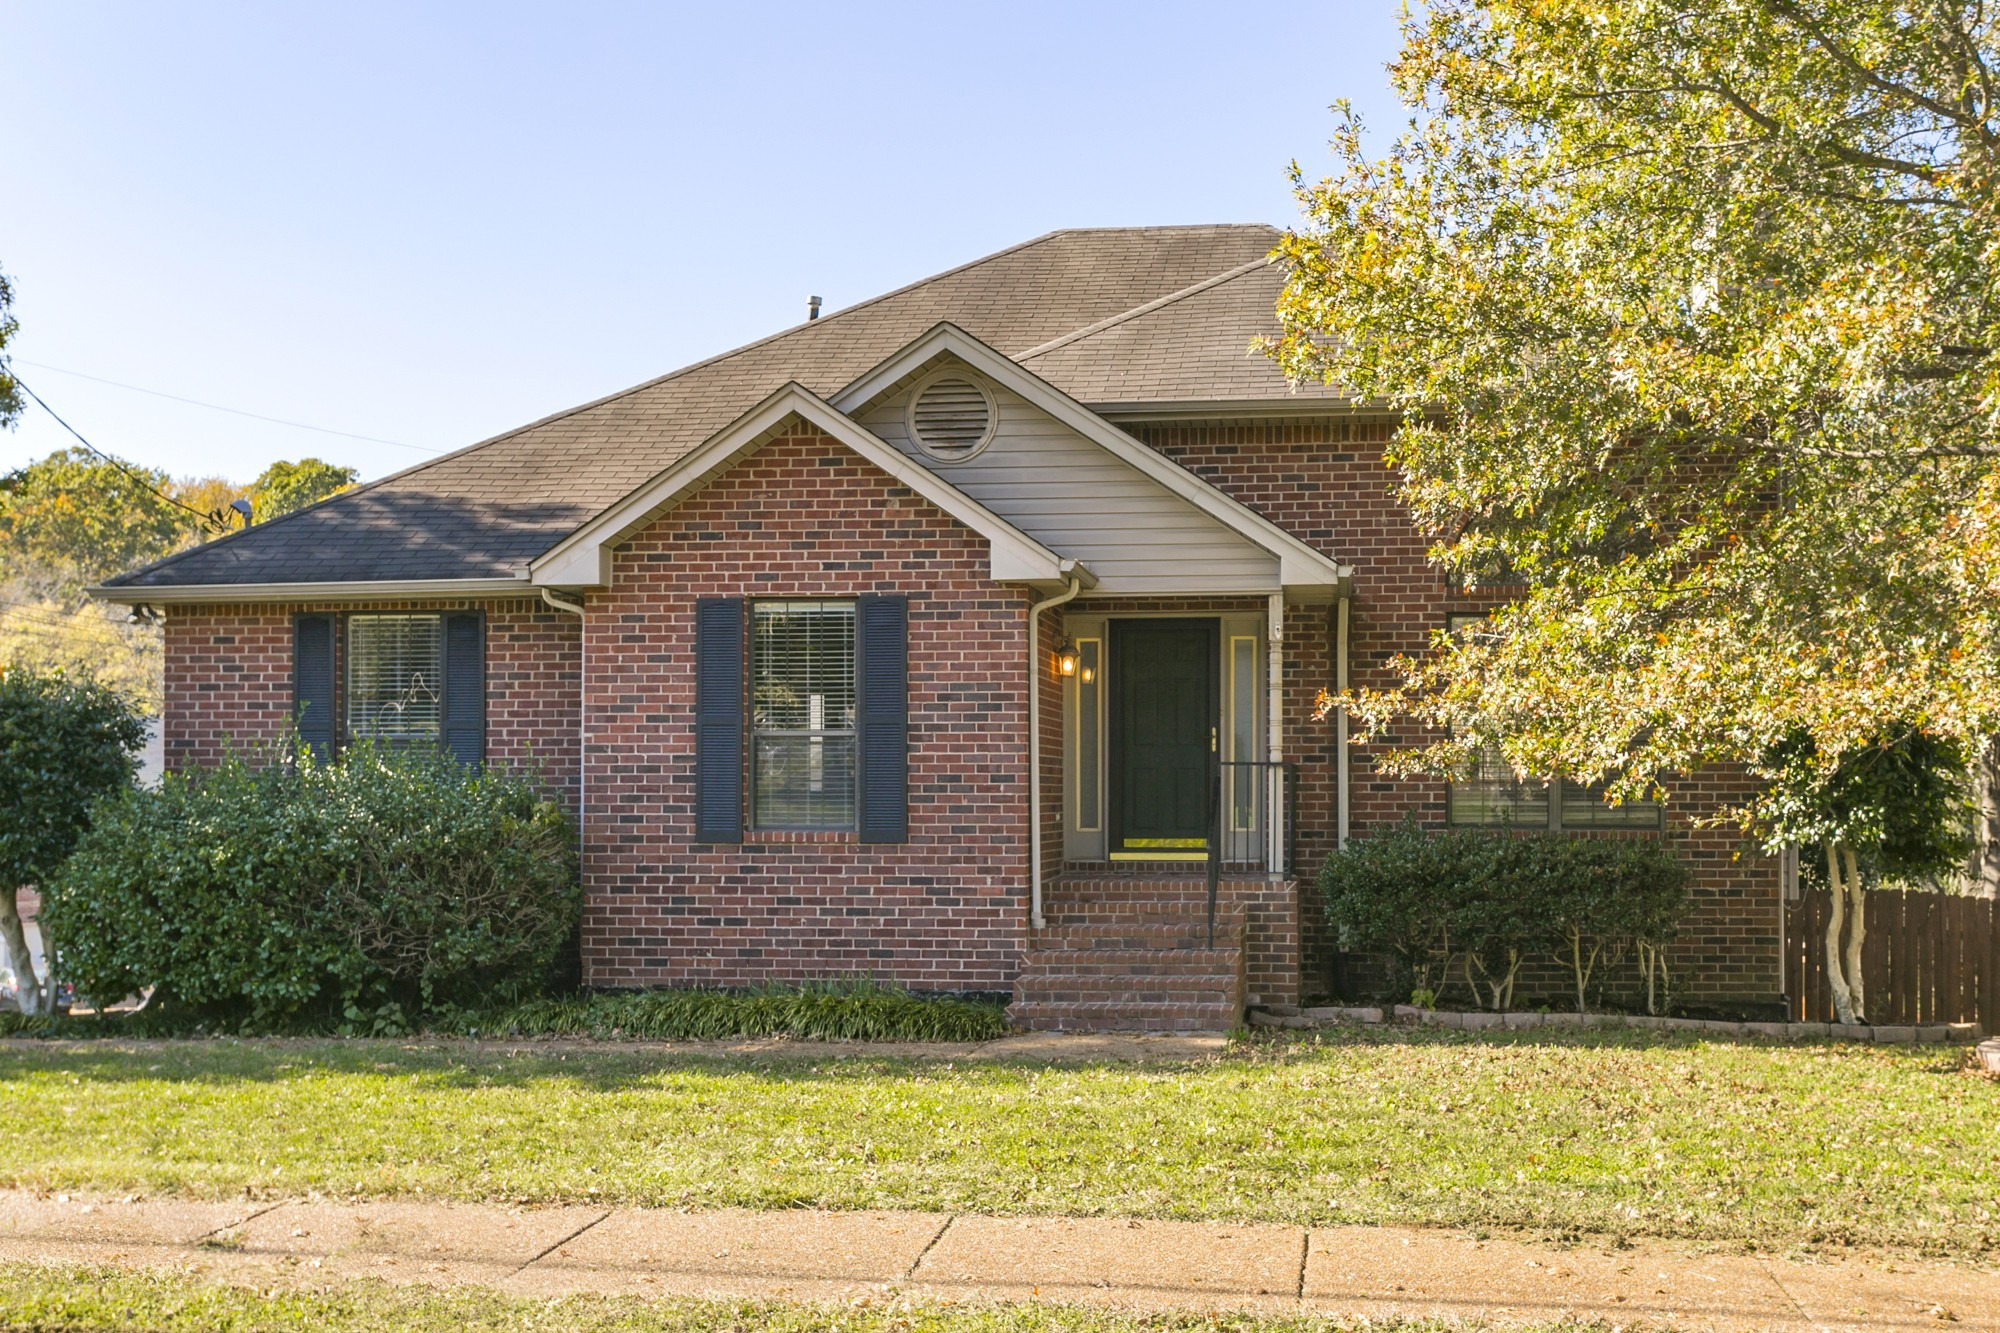 4037 Bryce Rd, Nashville, TN 37211 - Nashville, TN real estate listing